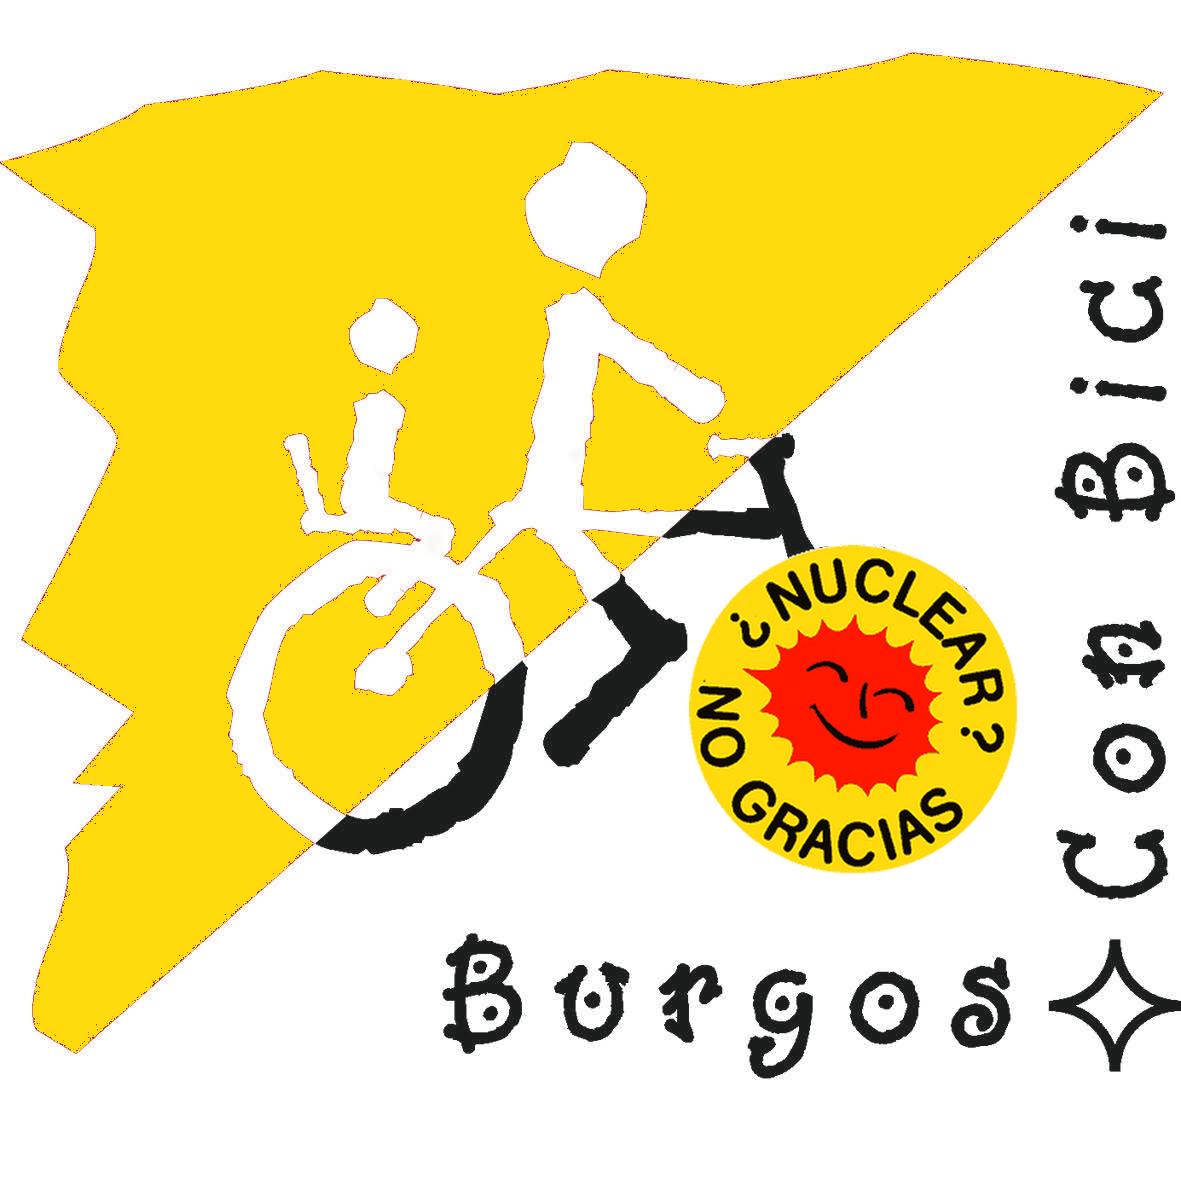 Logotipo burgos Con Bici amarillo. Nuclear no, gracias